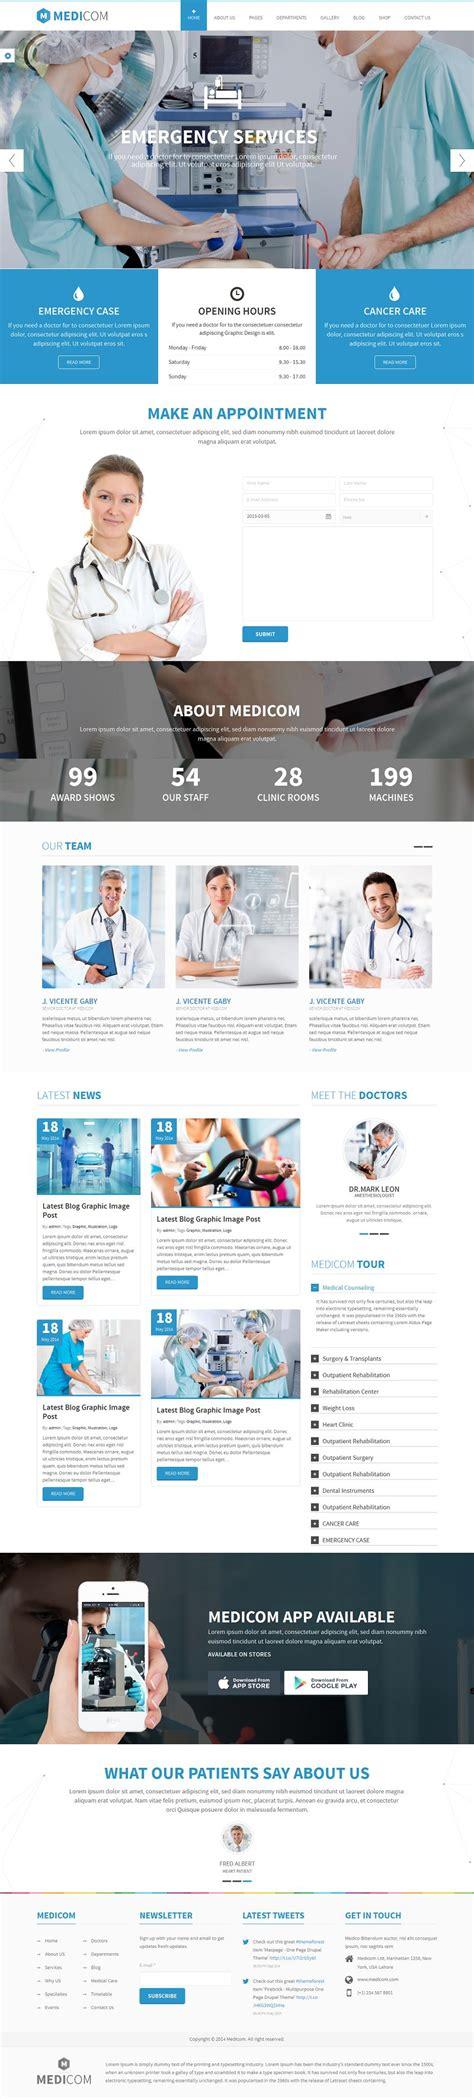 theme drupal health medicom medical health drupal ubercart ecommerce theme